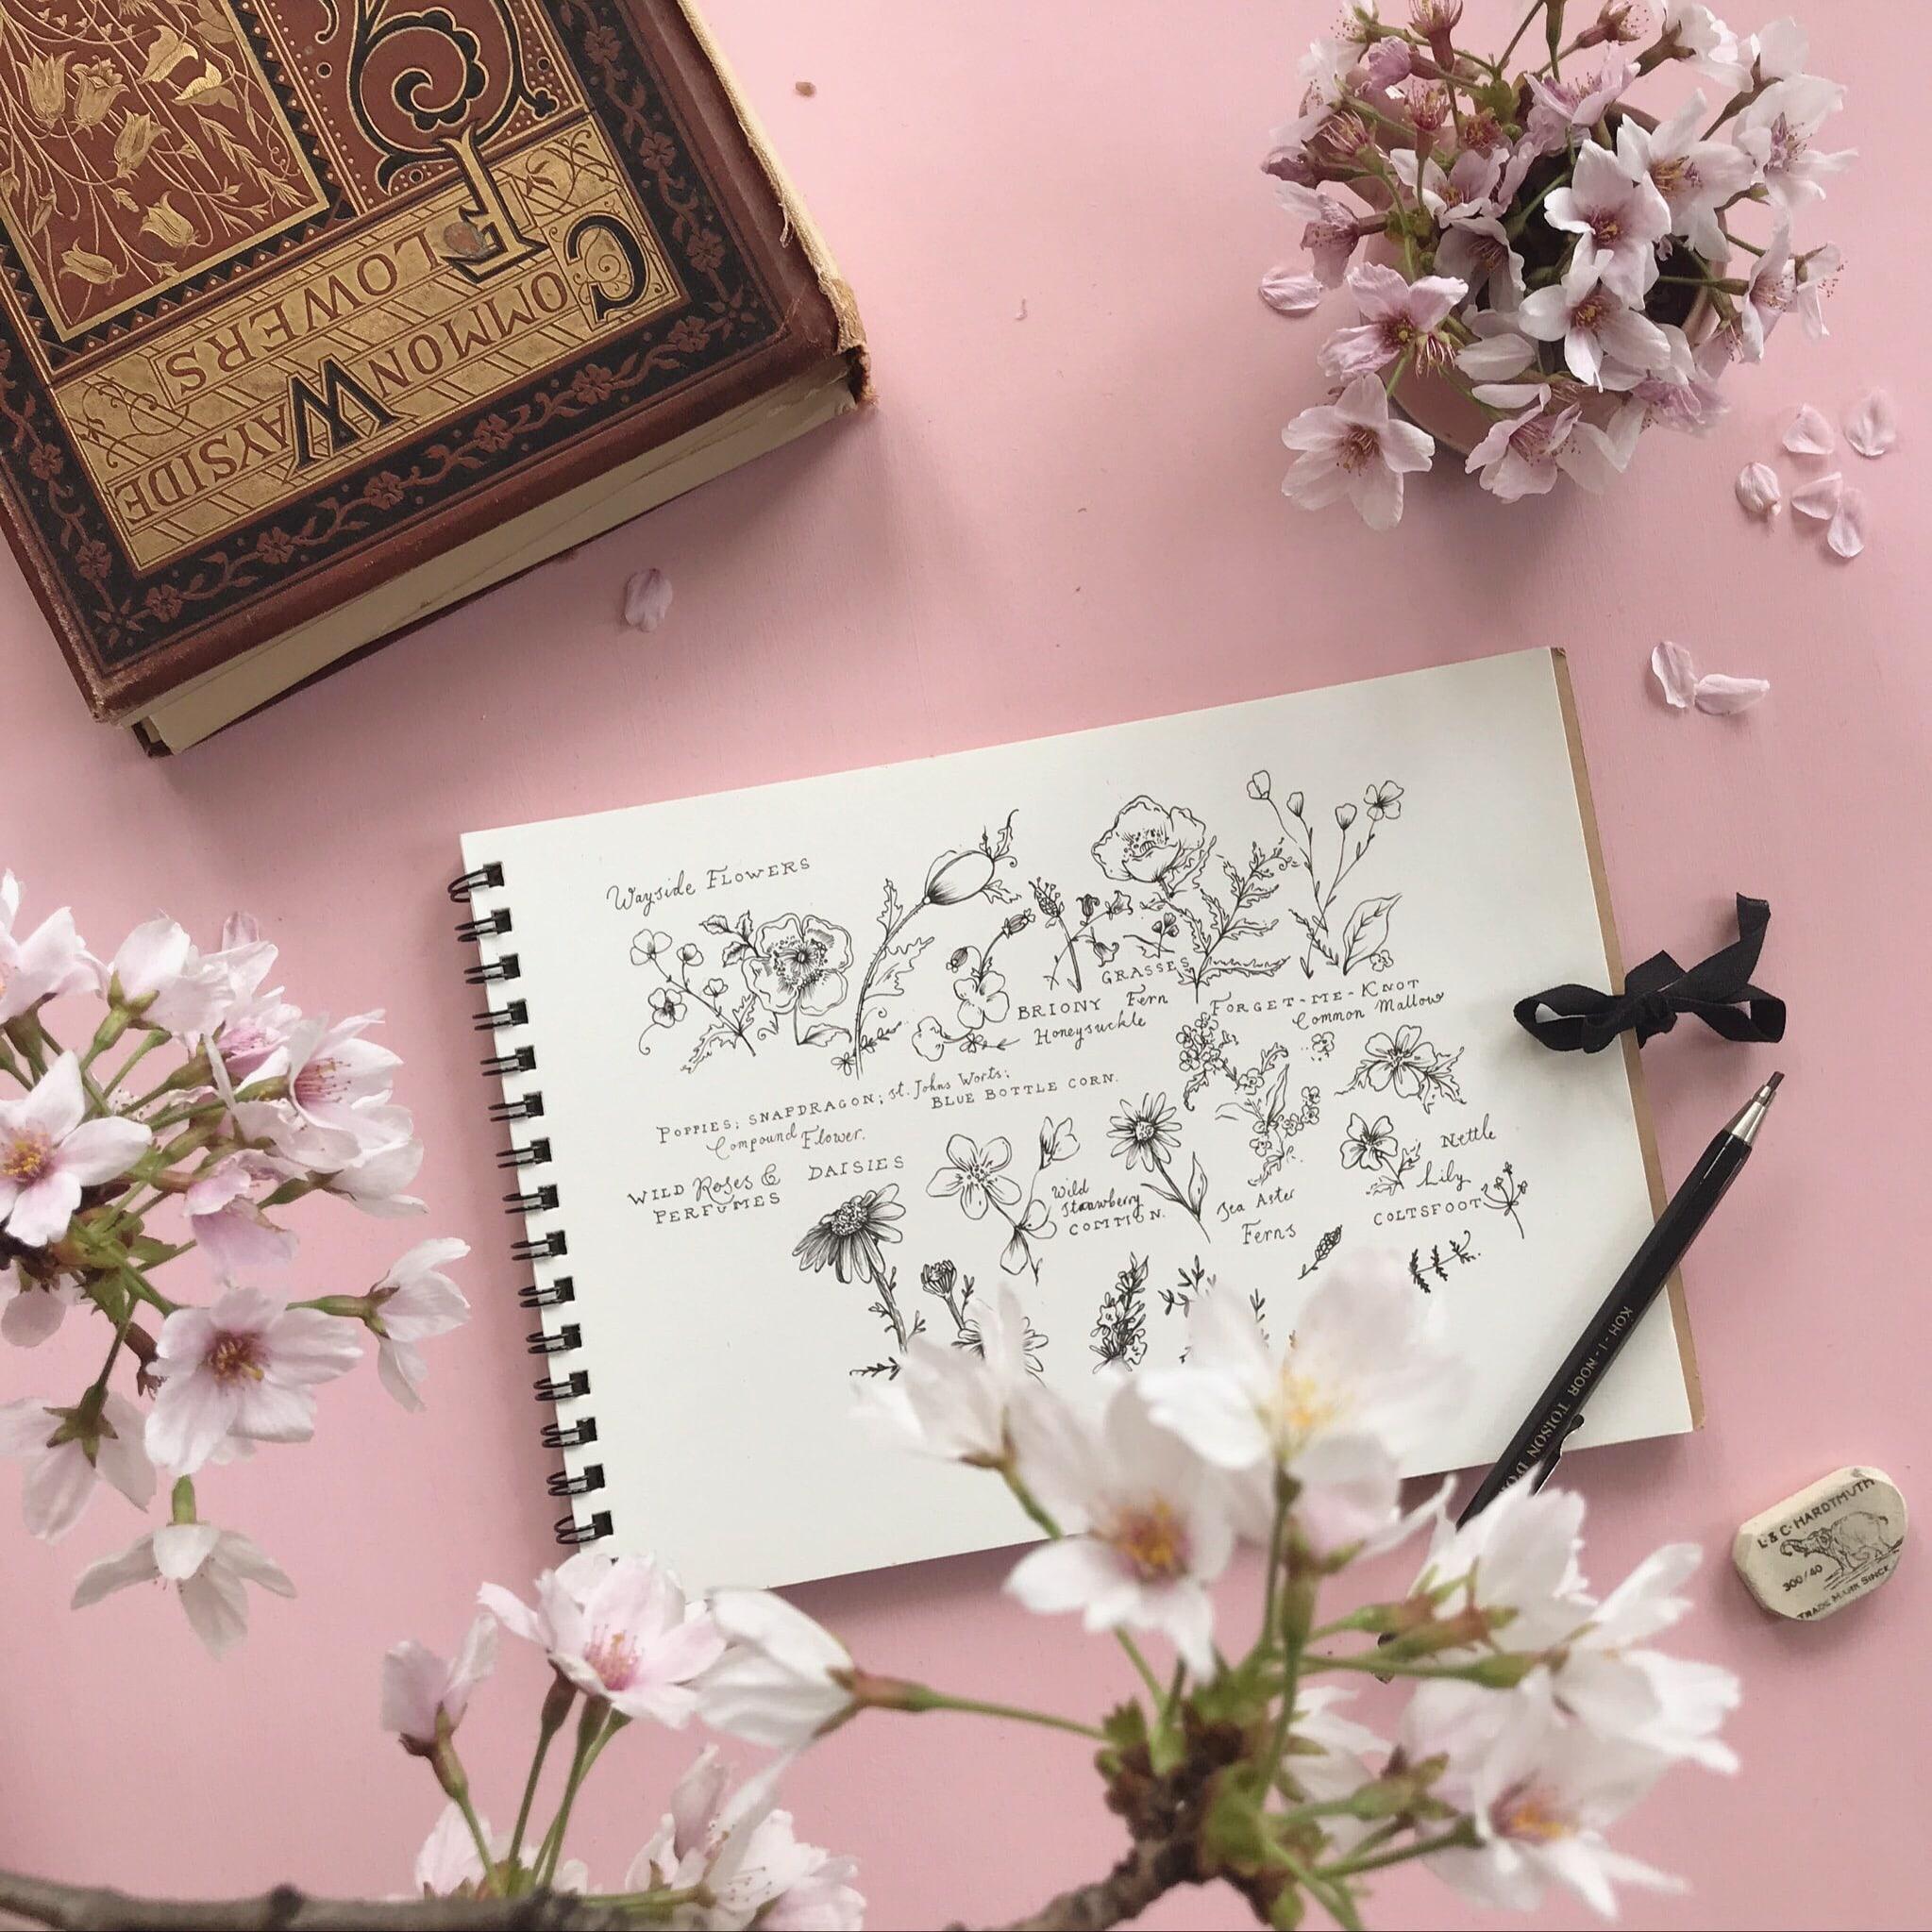 desk-flowers-min.JPG